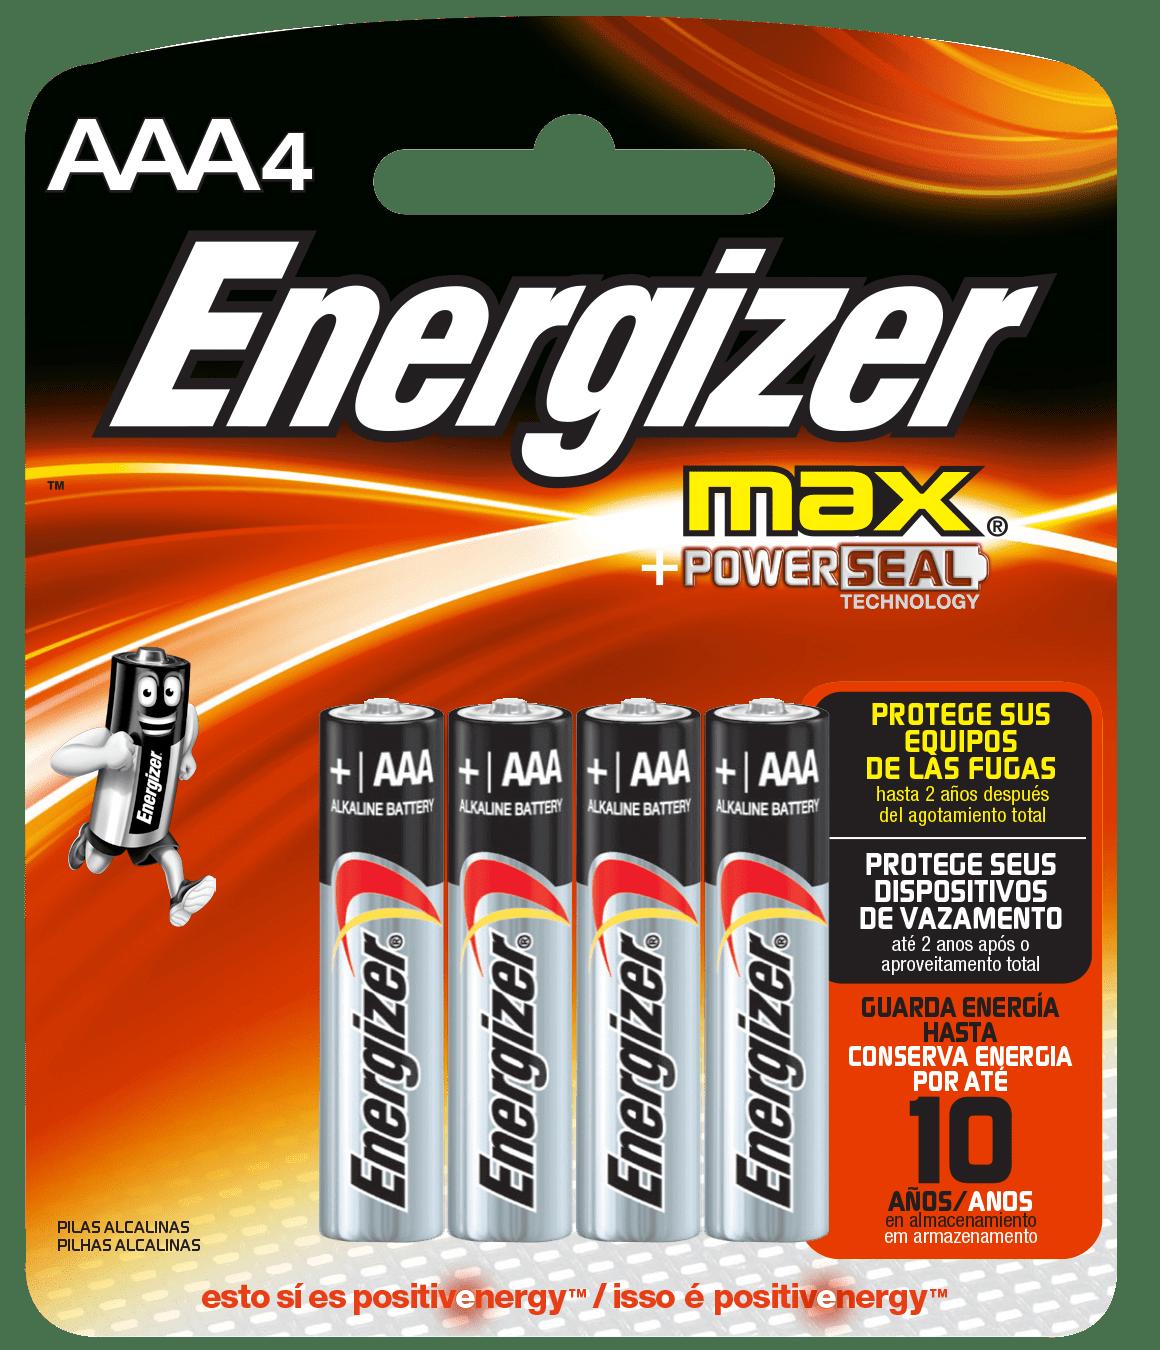 Pilas alcalinas pilas alcalinas energizer lr03 aaa - Tipos de pilas alcalinas ...